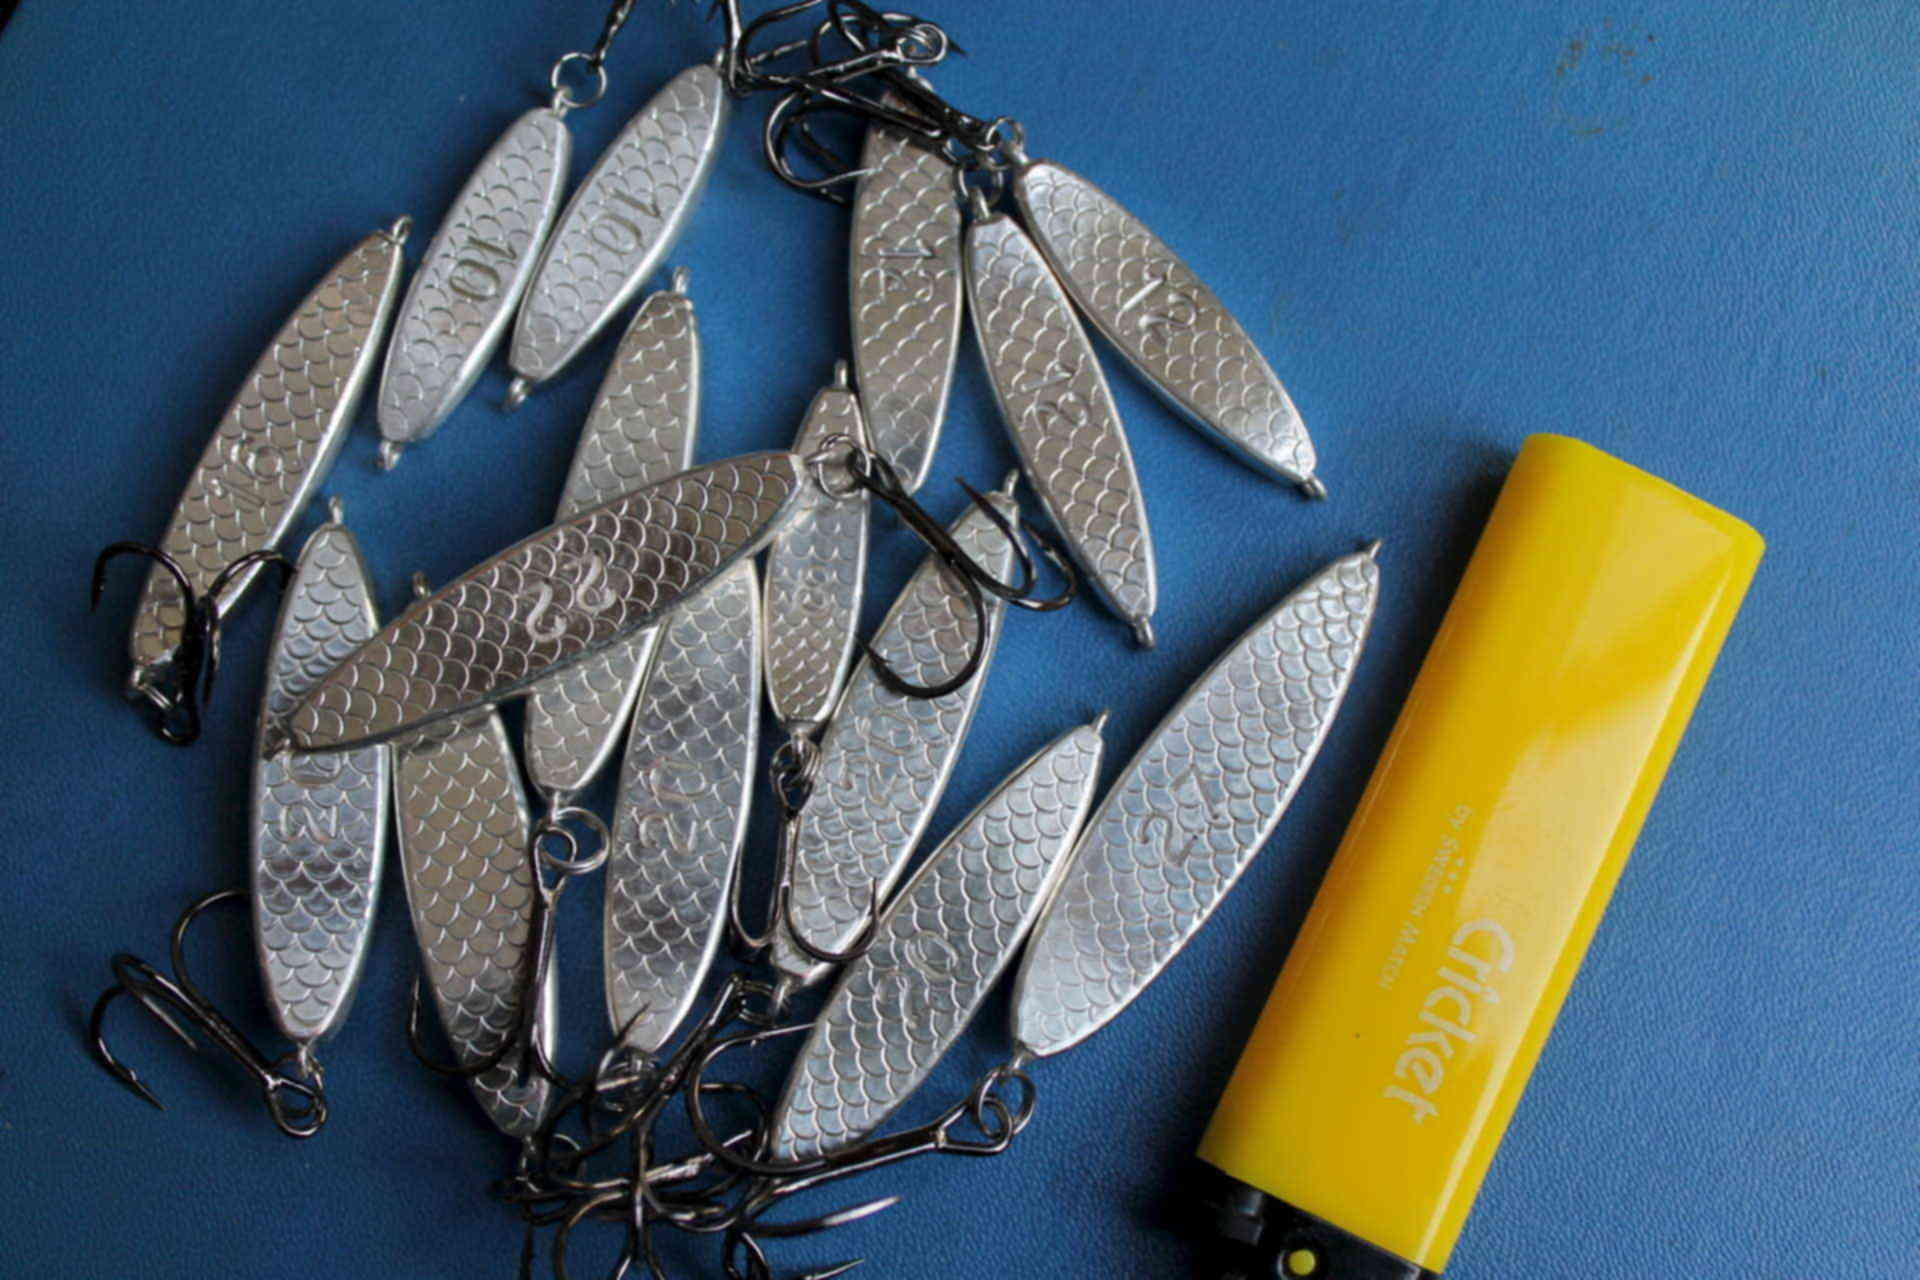 Ловля жереха на спиннинг: снасть, приманка и техника